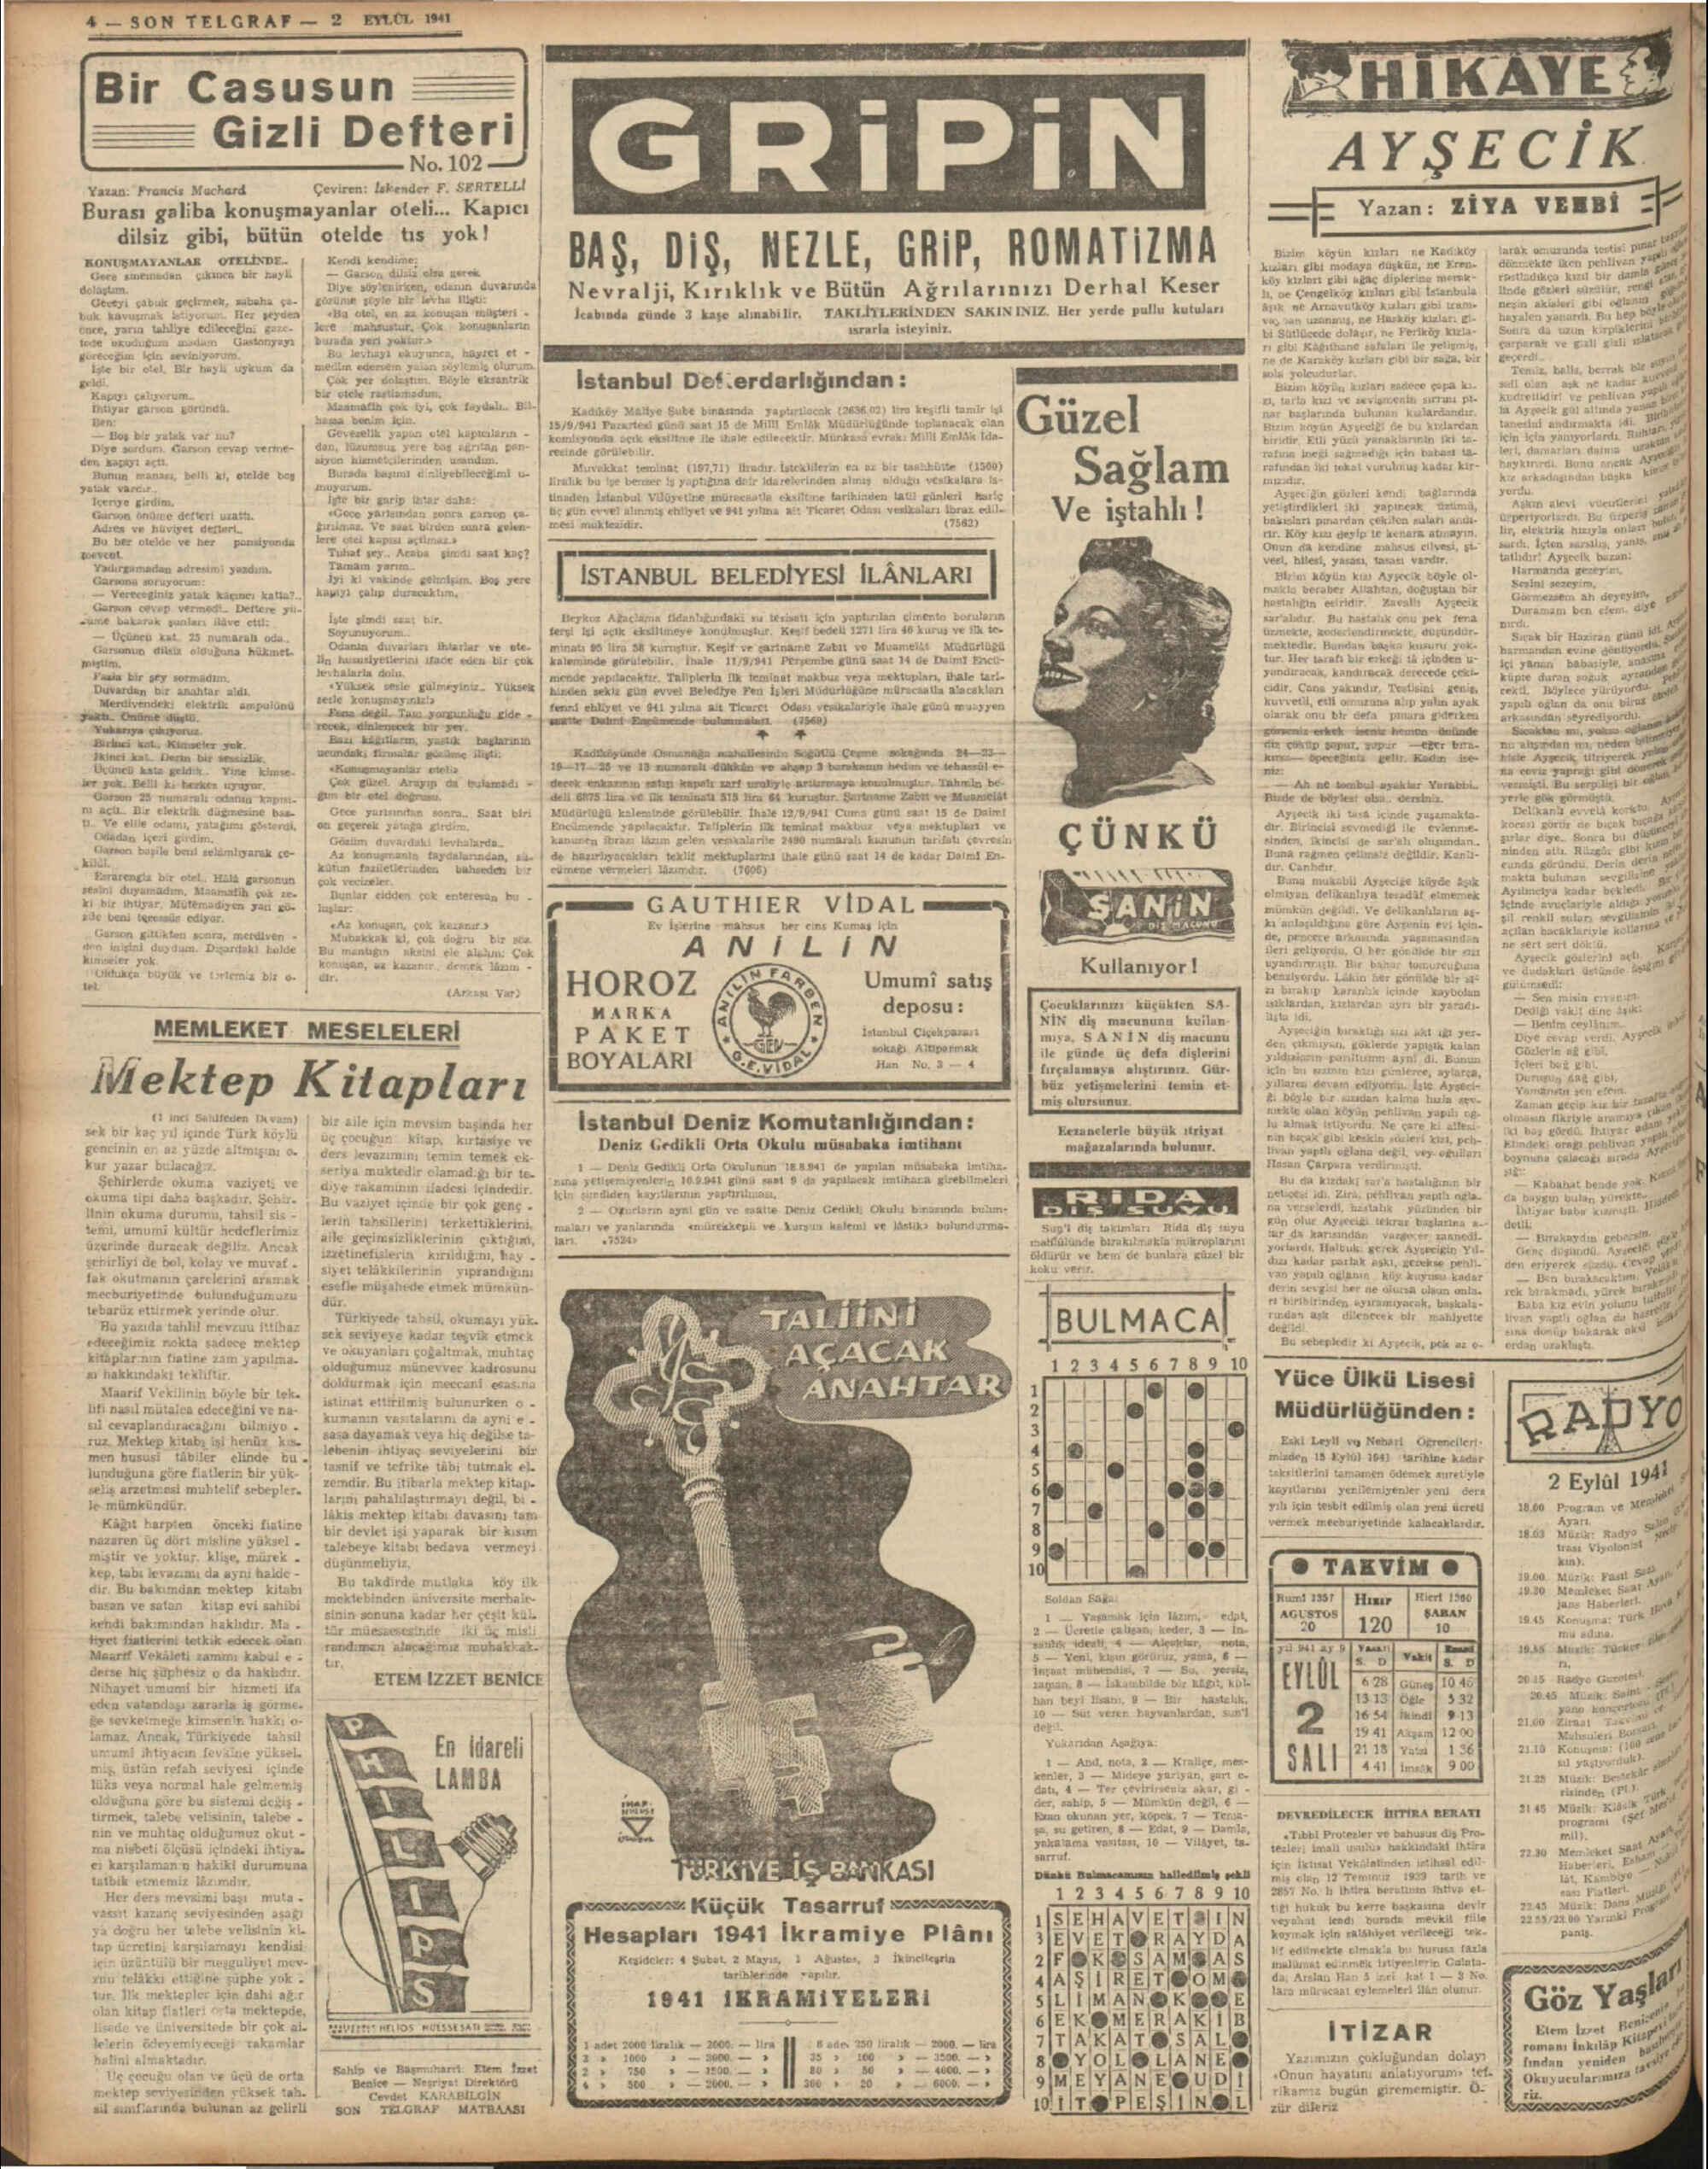 2 Eylül 1941 Tarihli Son Telgraf Dergisi Sayfa 4